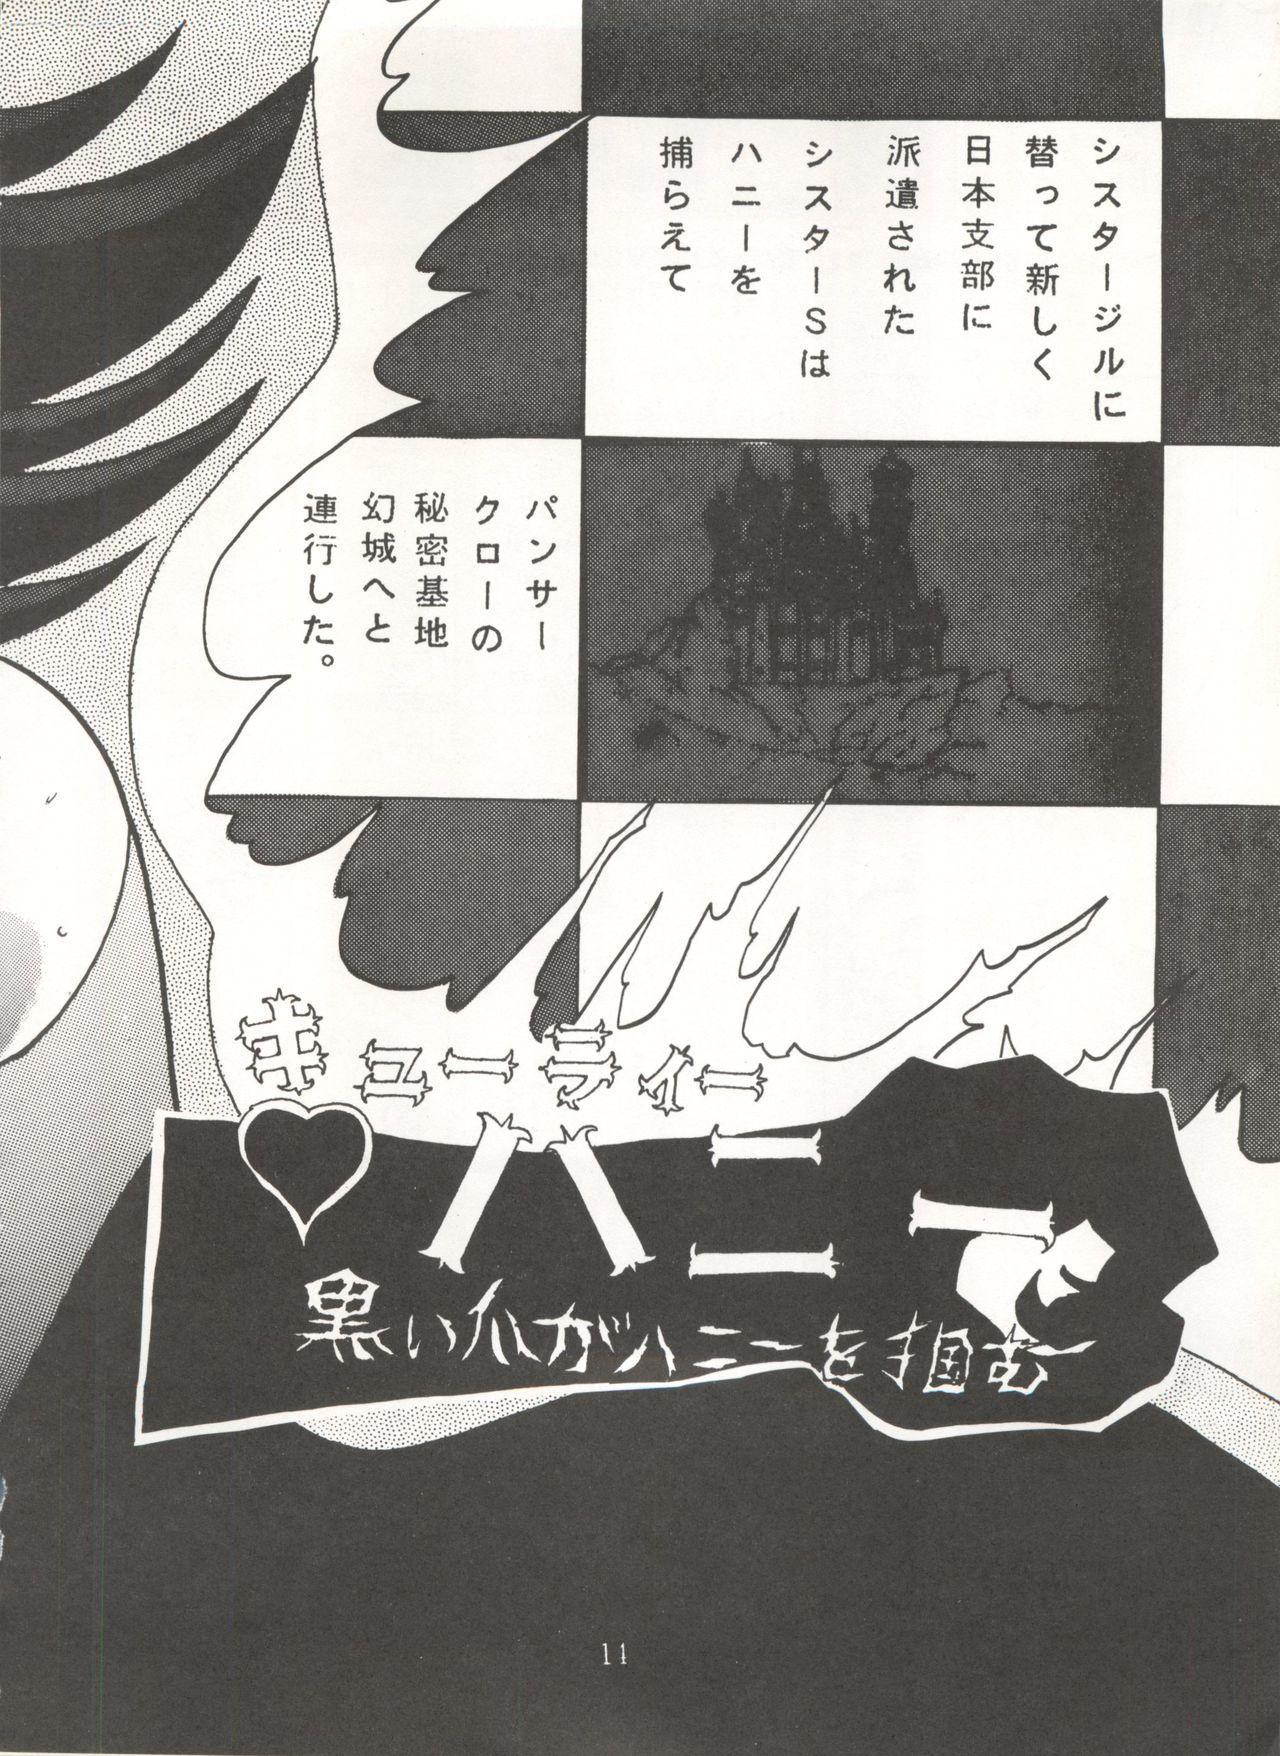 [Global One (MARO)] Sadistic 5 (Cutey Honey, Devilman, Sailor Moon), [Global One (MARO)] Sadistic (Dirty Pair, Fushigi no Umi no Nadia, Sailor Moon), [Studio Ikkatsumajin] .ribbon (Hime-chan's Ribbon) 13